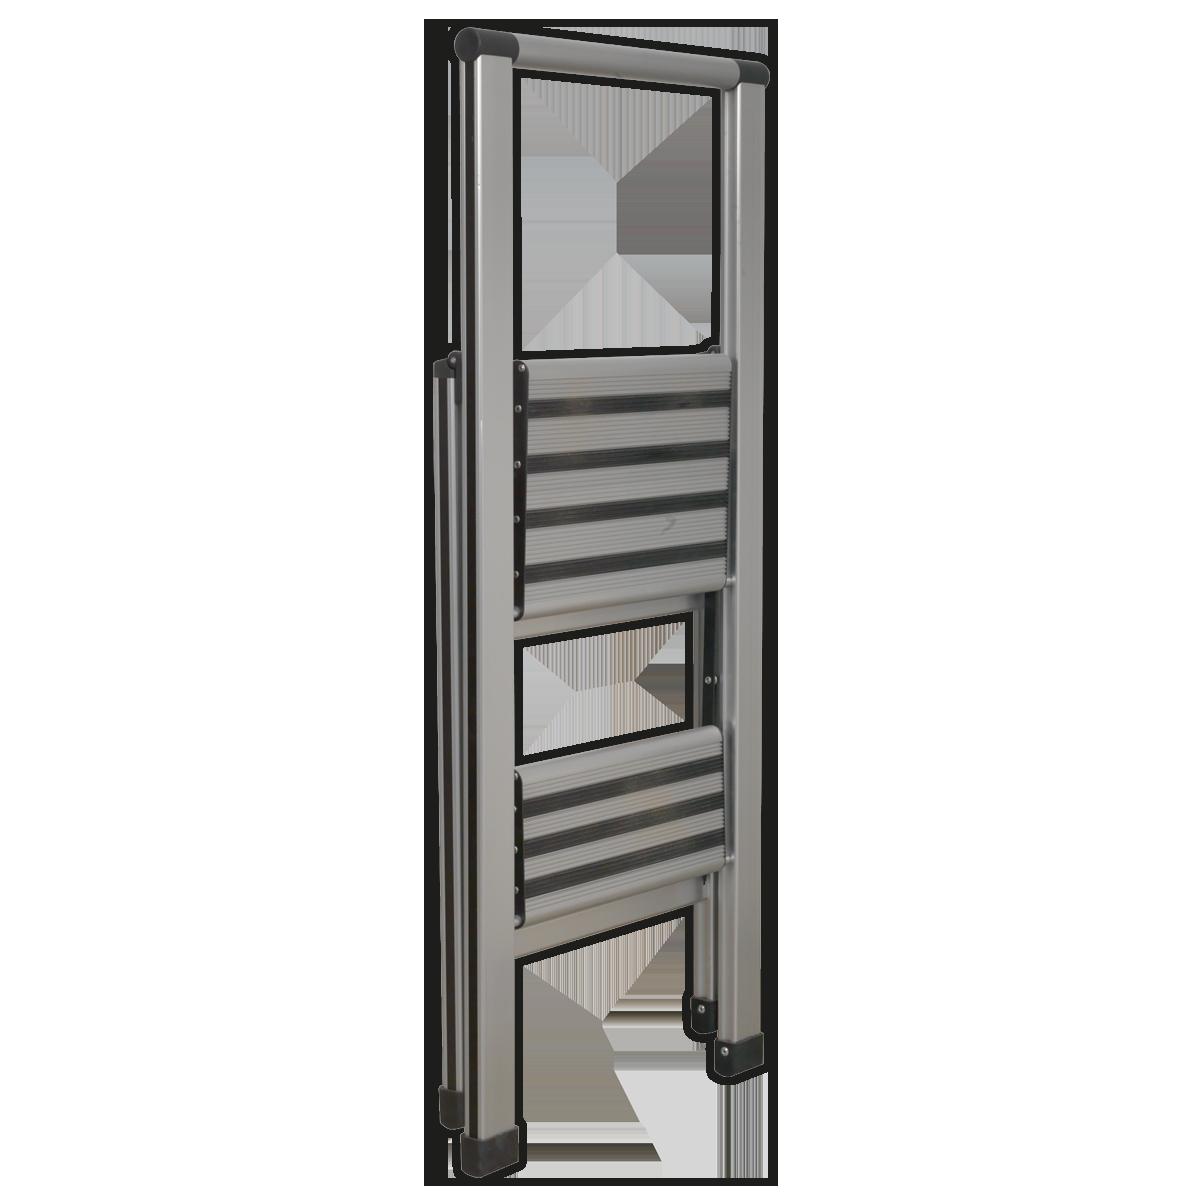 Aluminium Professional Folding Step Ladder 2-Step 150kg Capacity